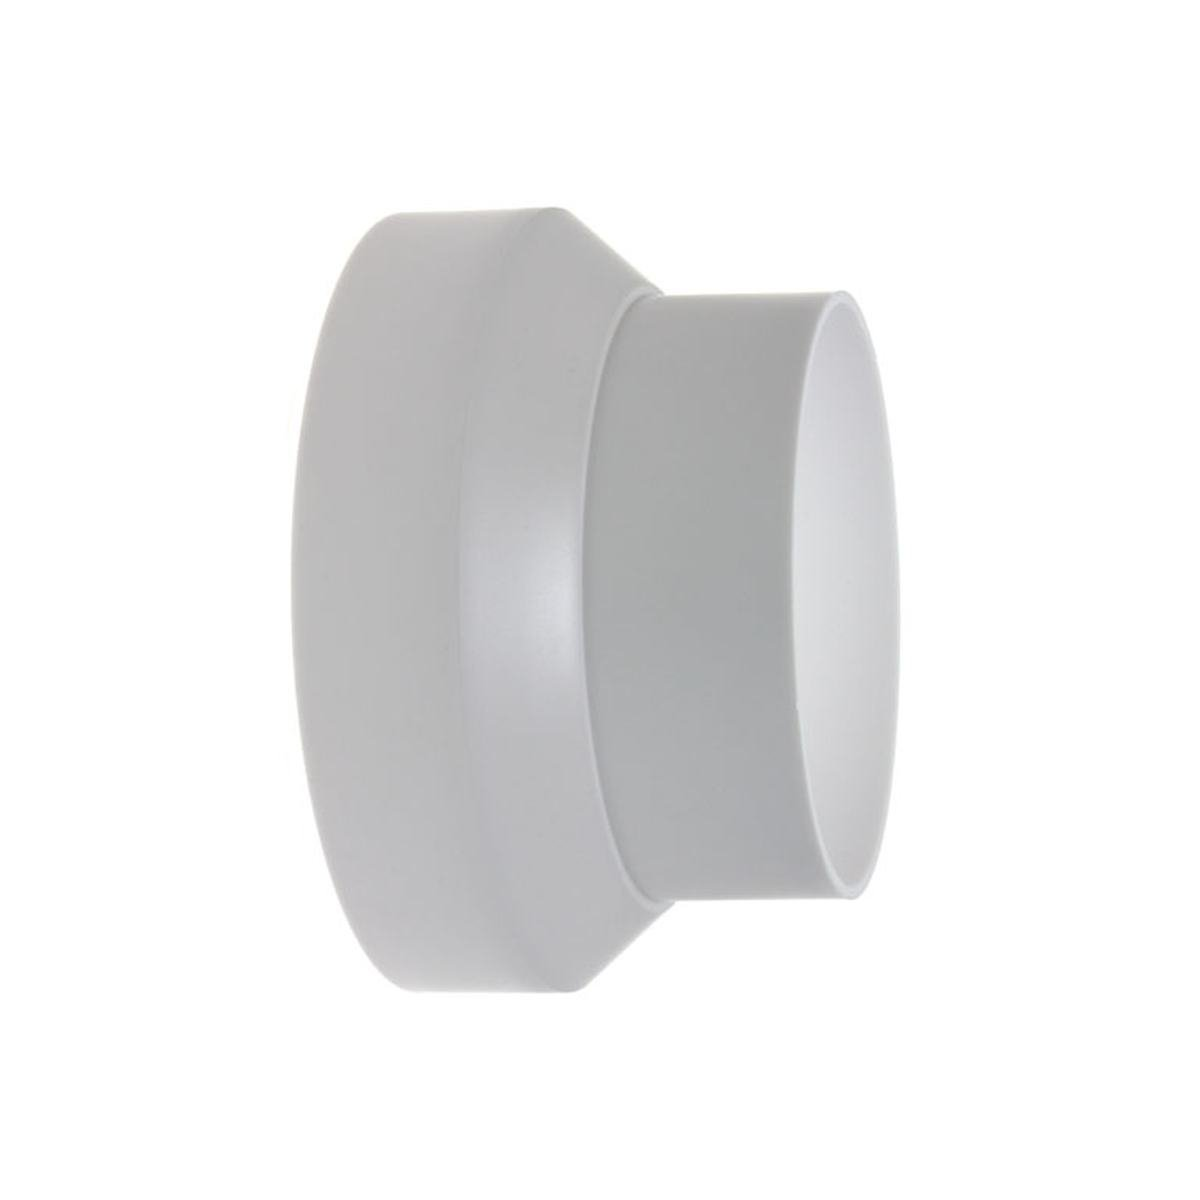 Reduceringspip Ø150 - Ø125 mm.